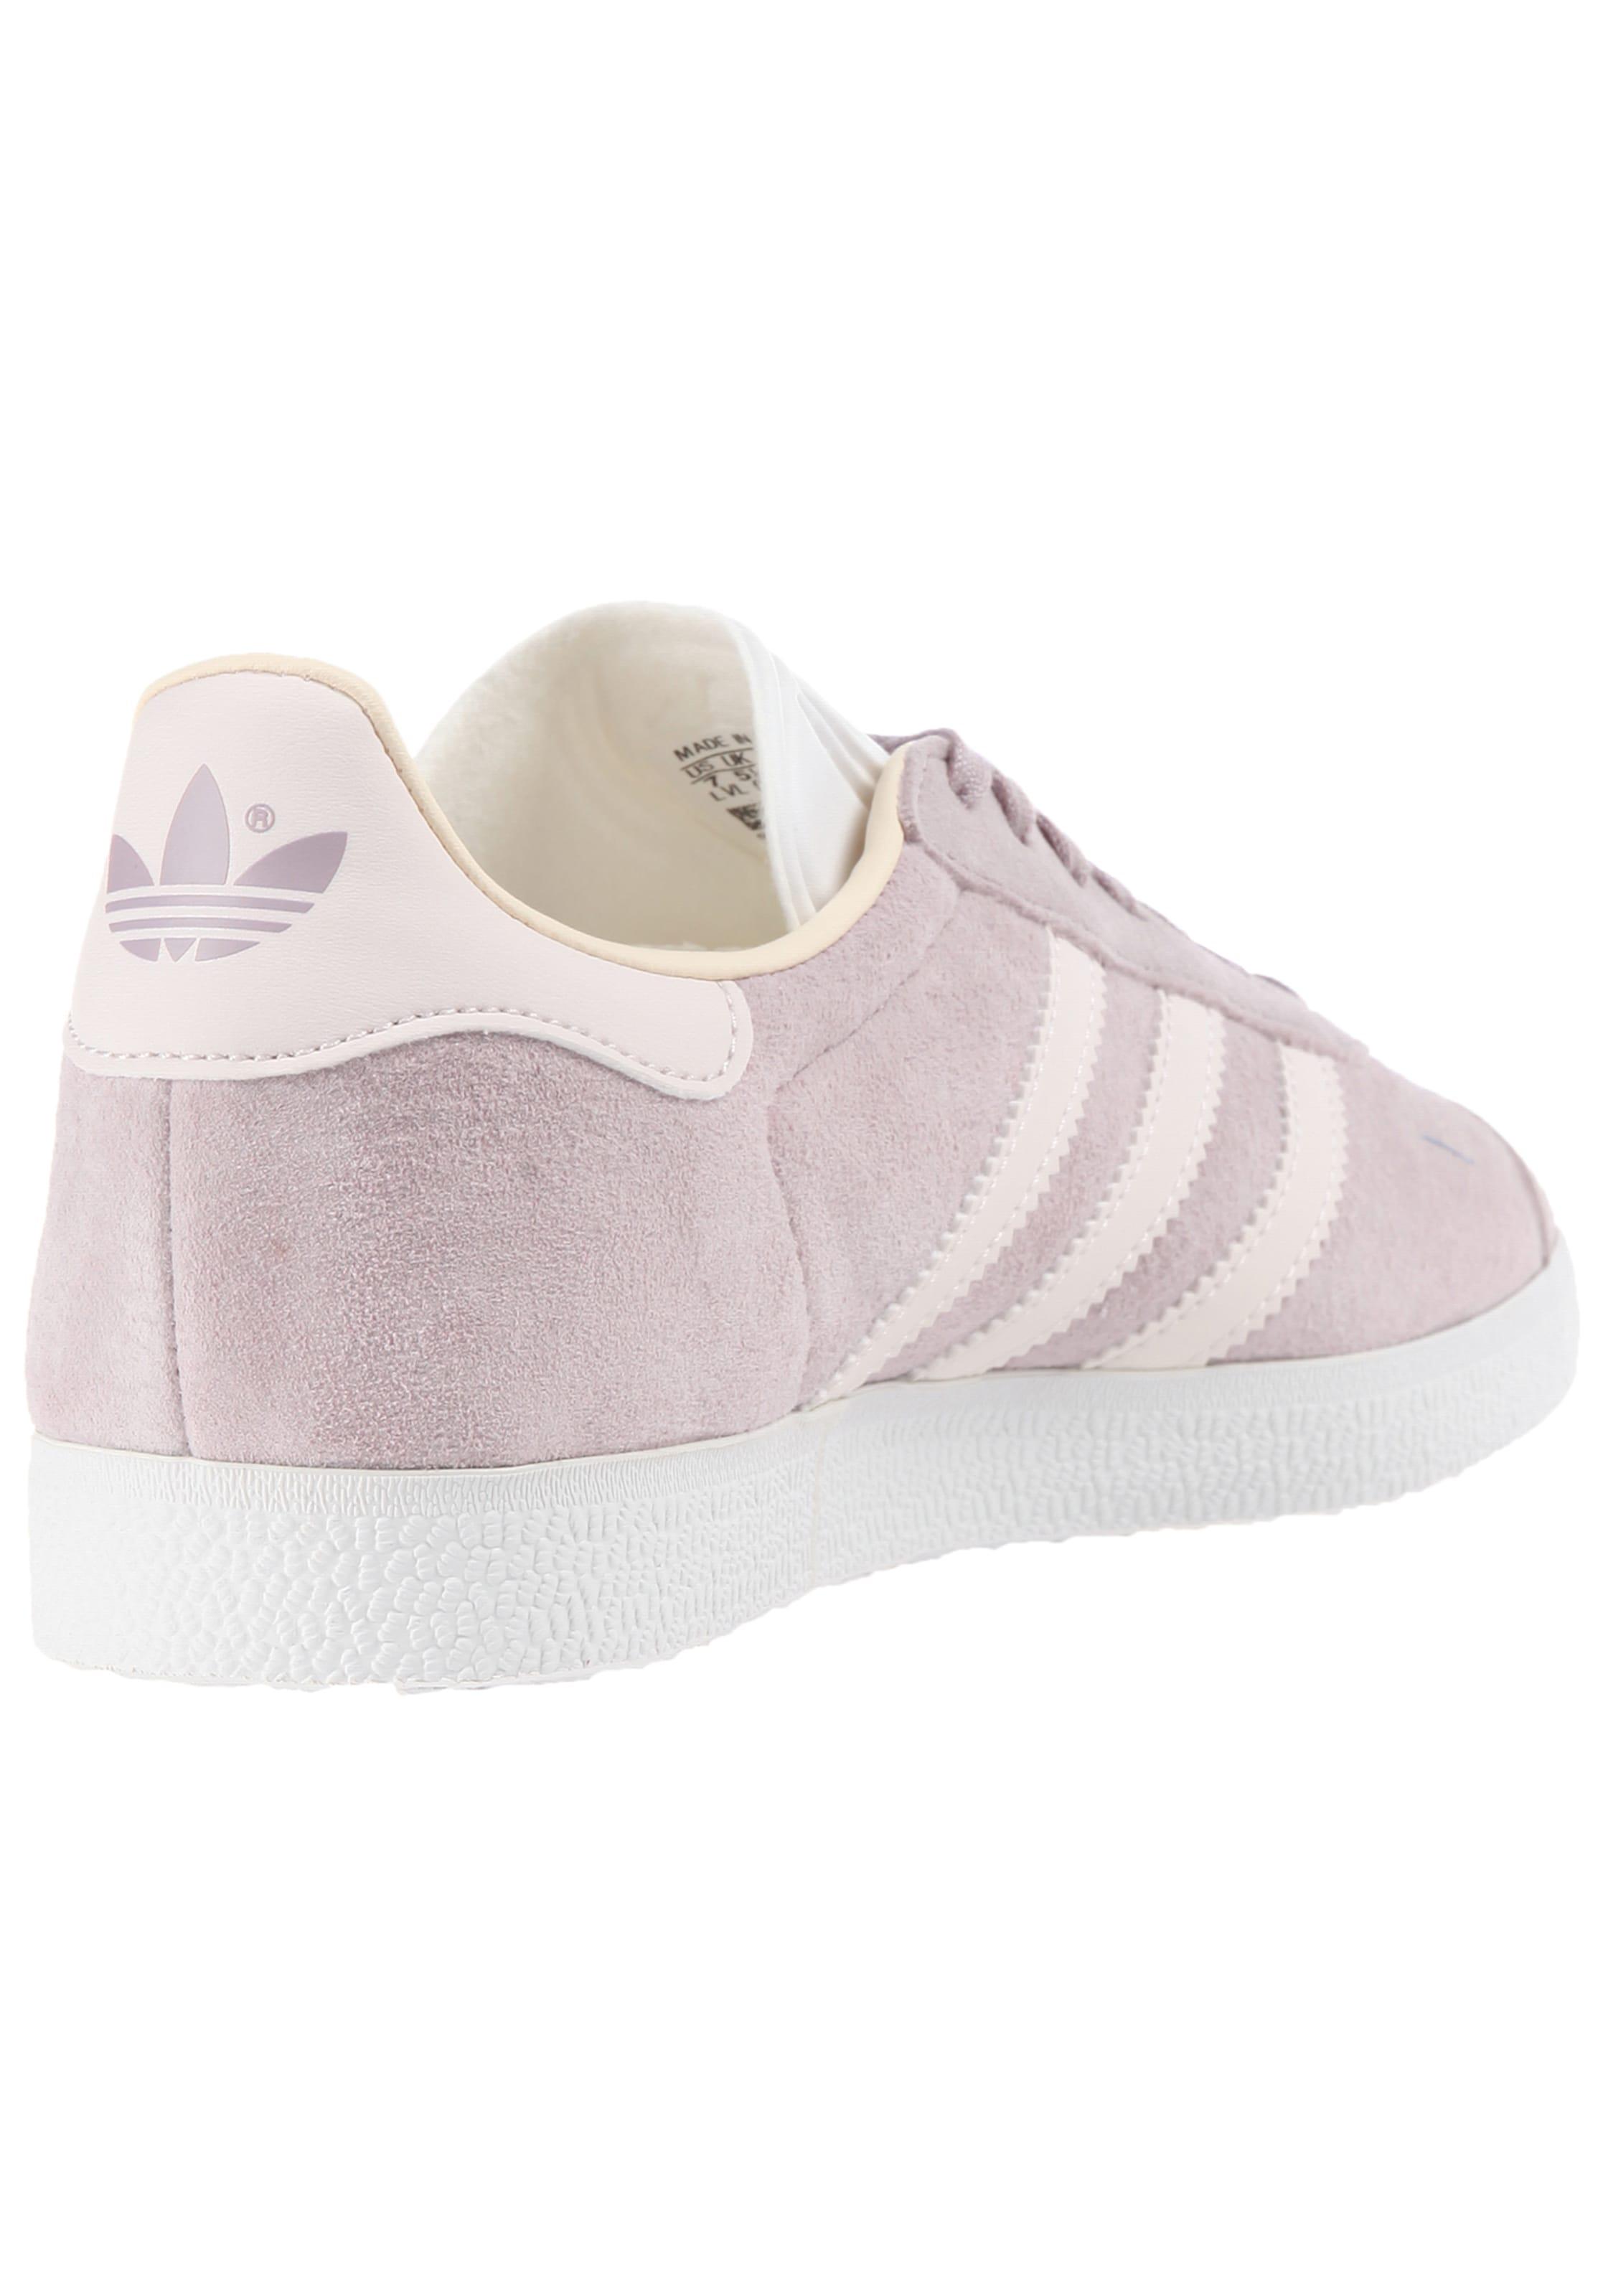 Originals Sneaker W' 'gazelle FliederOffwhite Adidas In F1clTKJ3